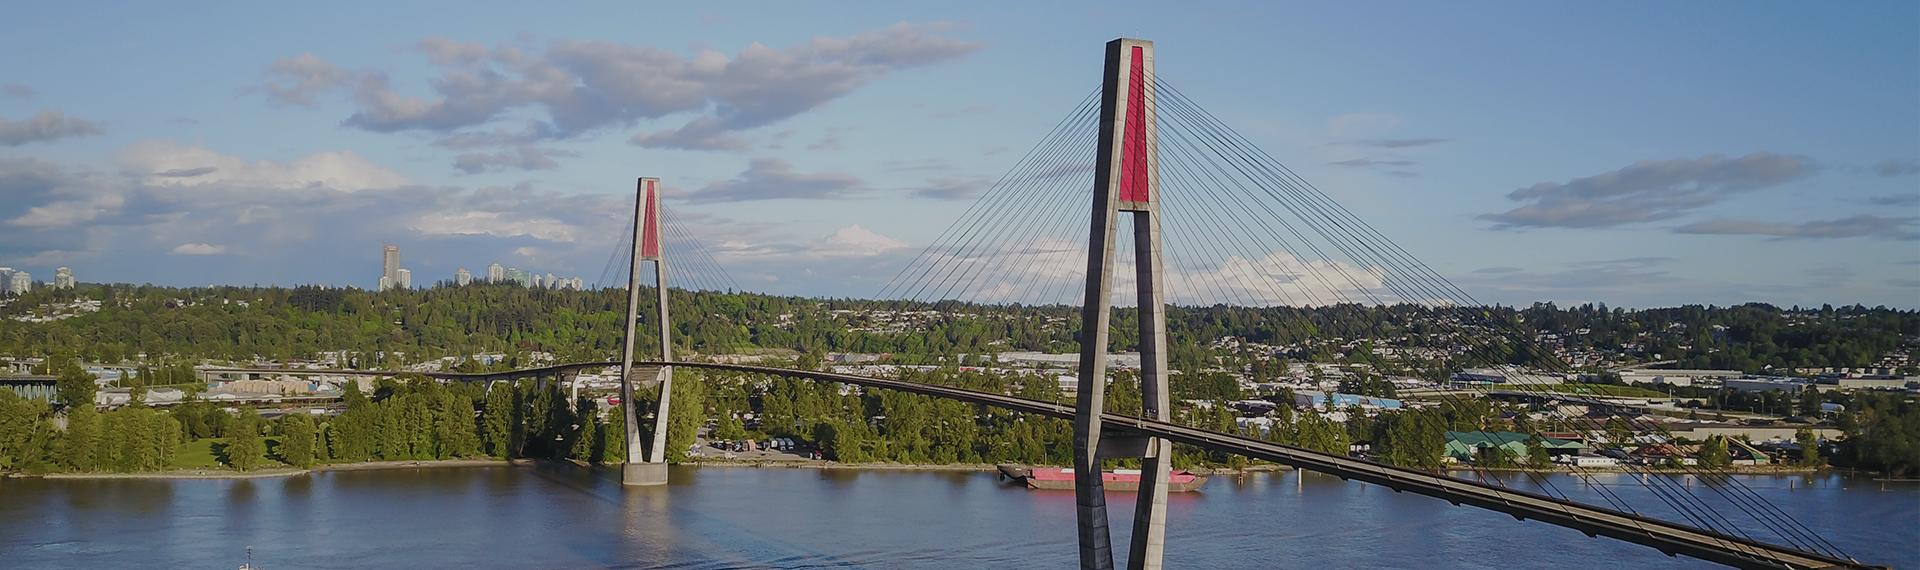 Sky Bridge over Fraser River